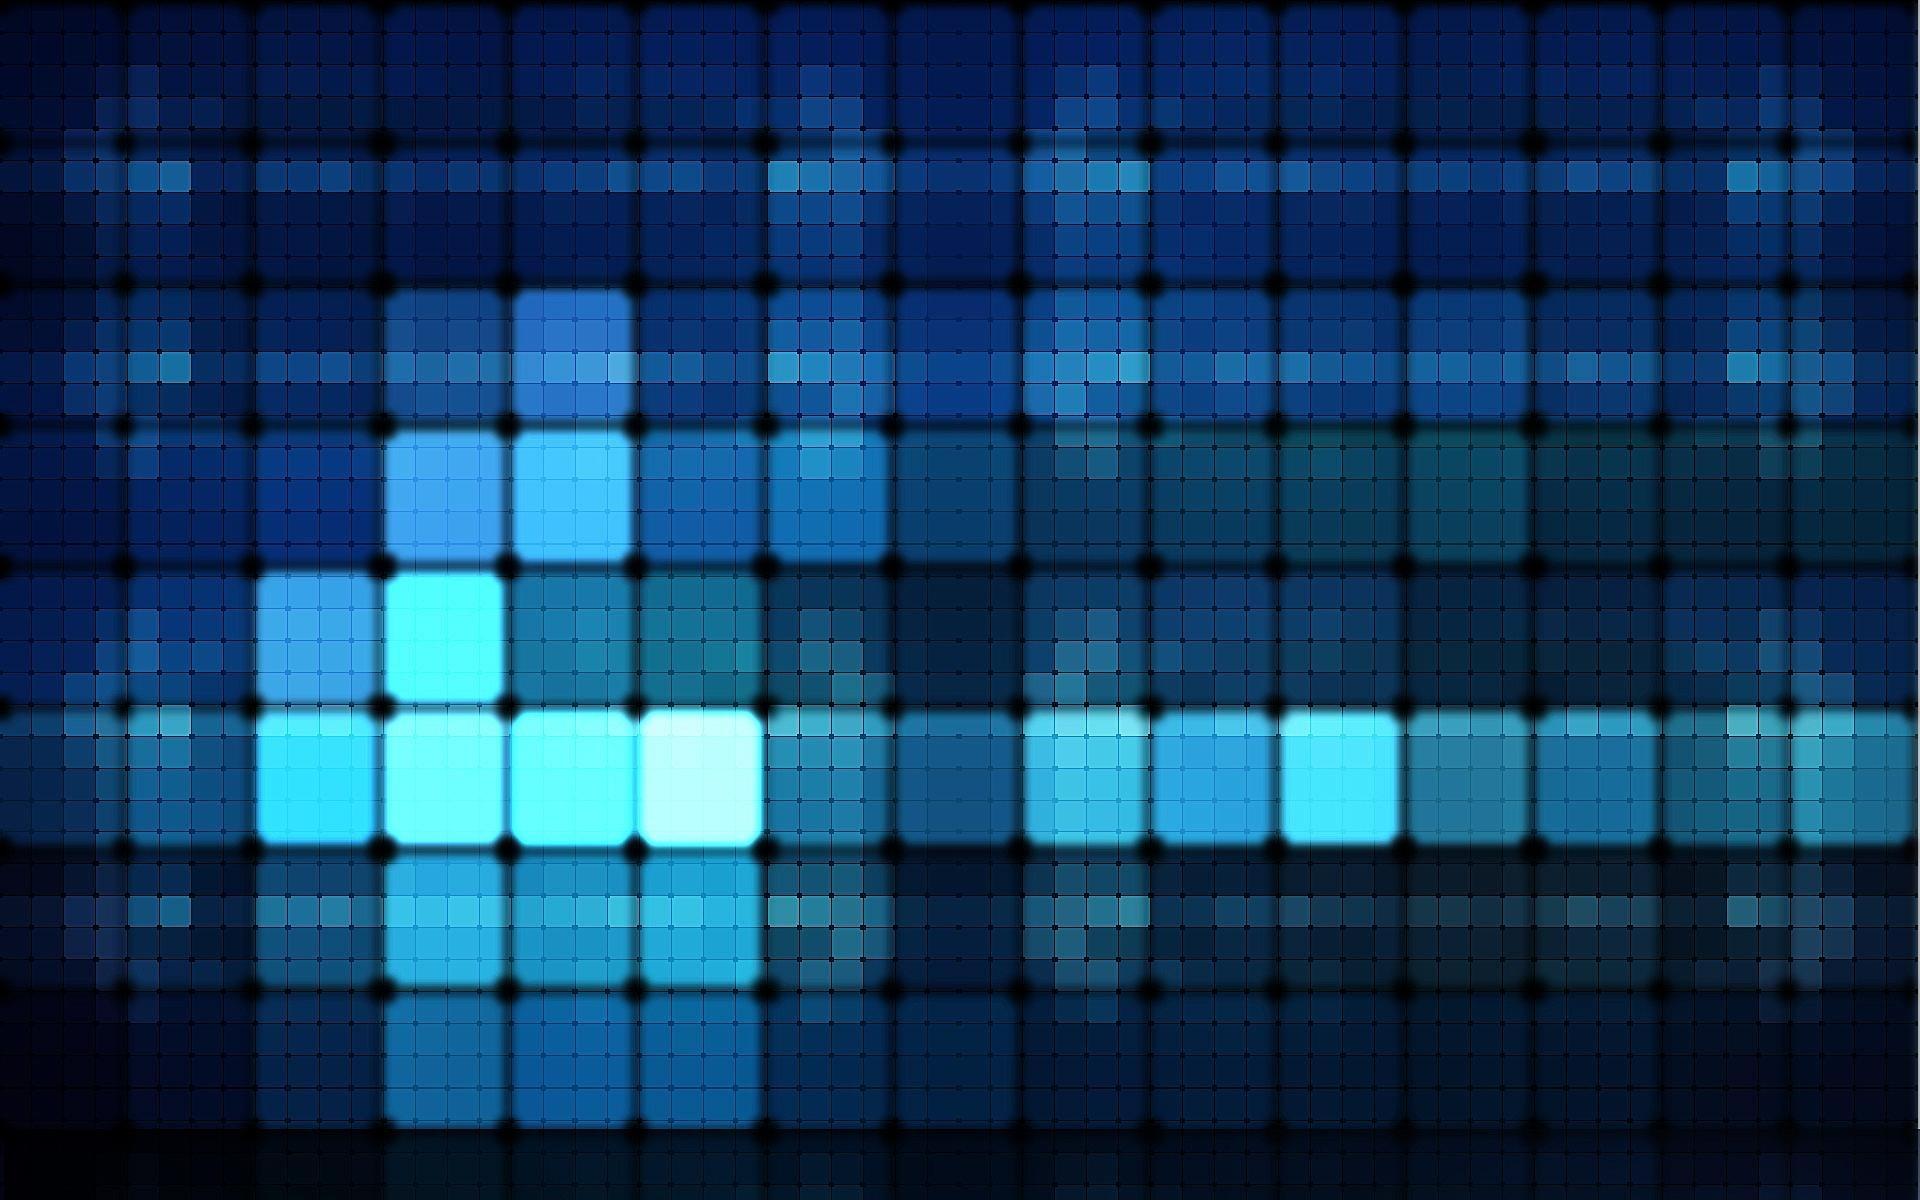 [Resim: pattern_texture11721ws5p.jpg]